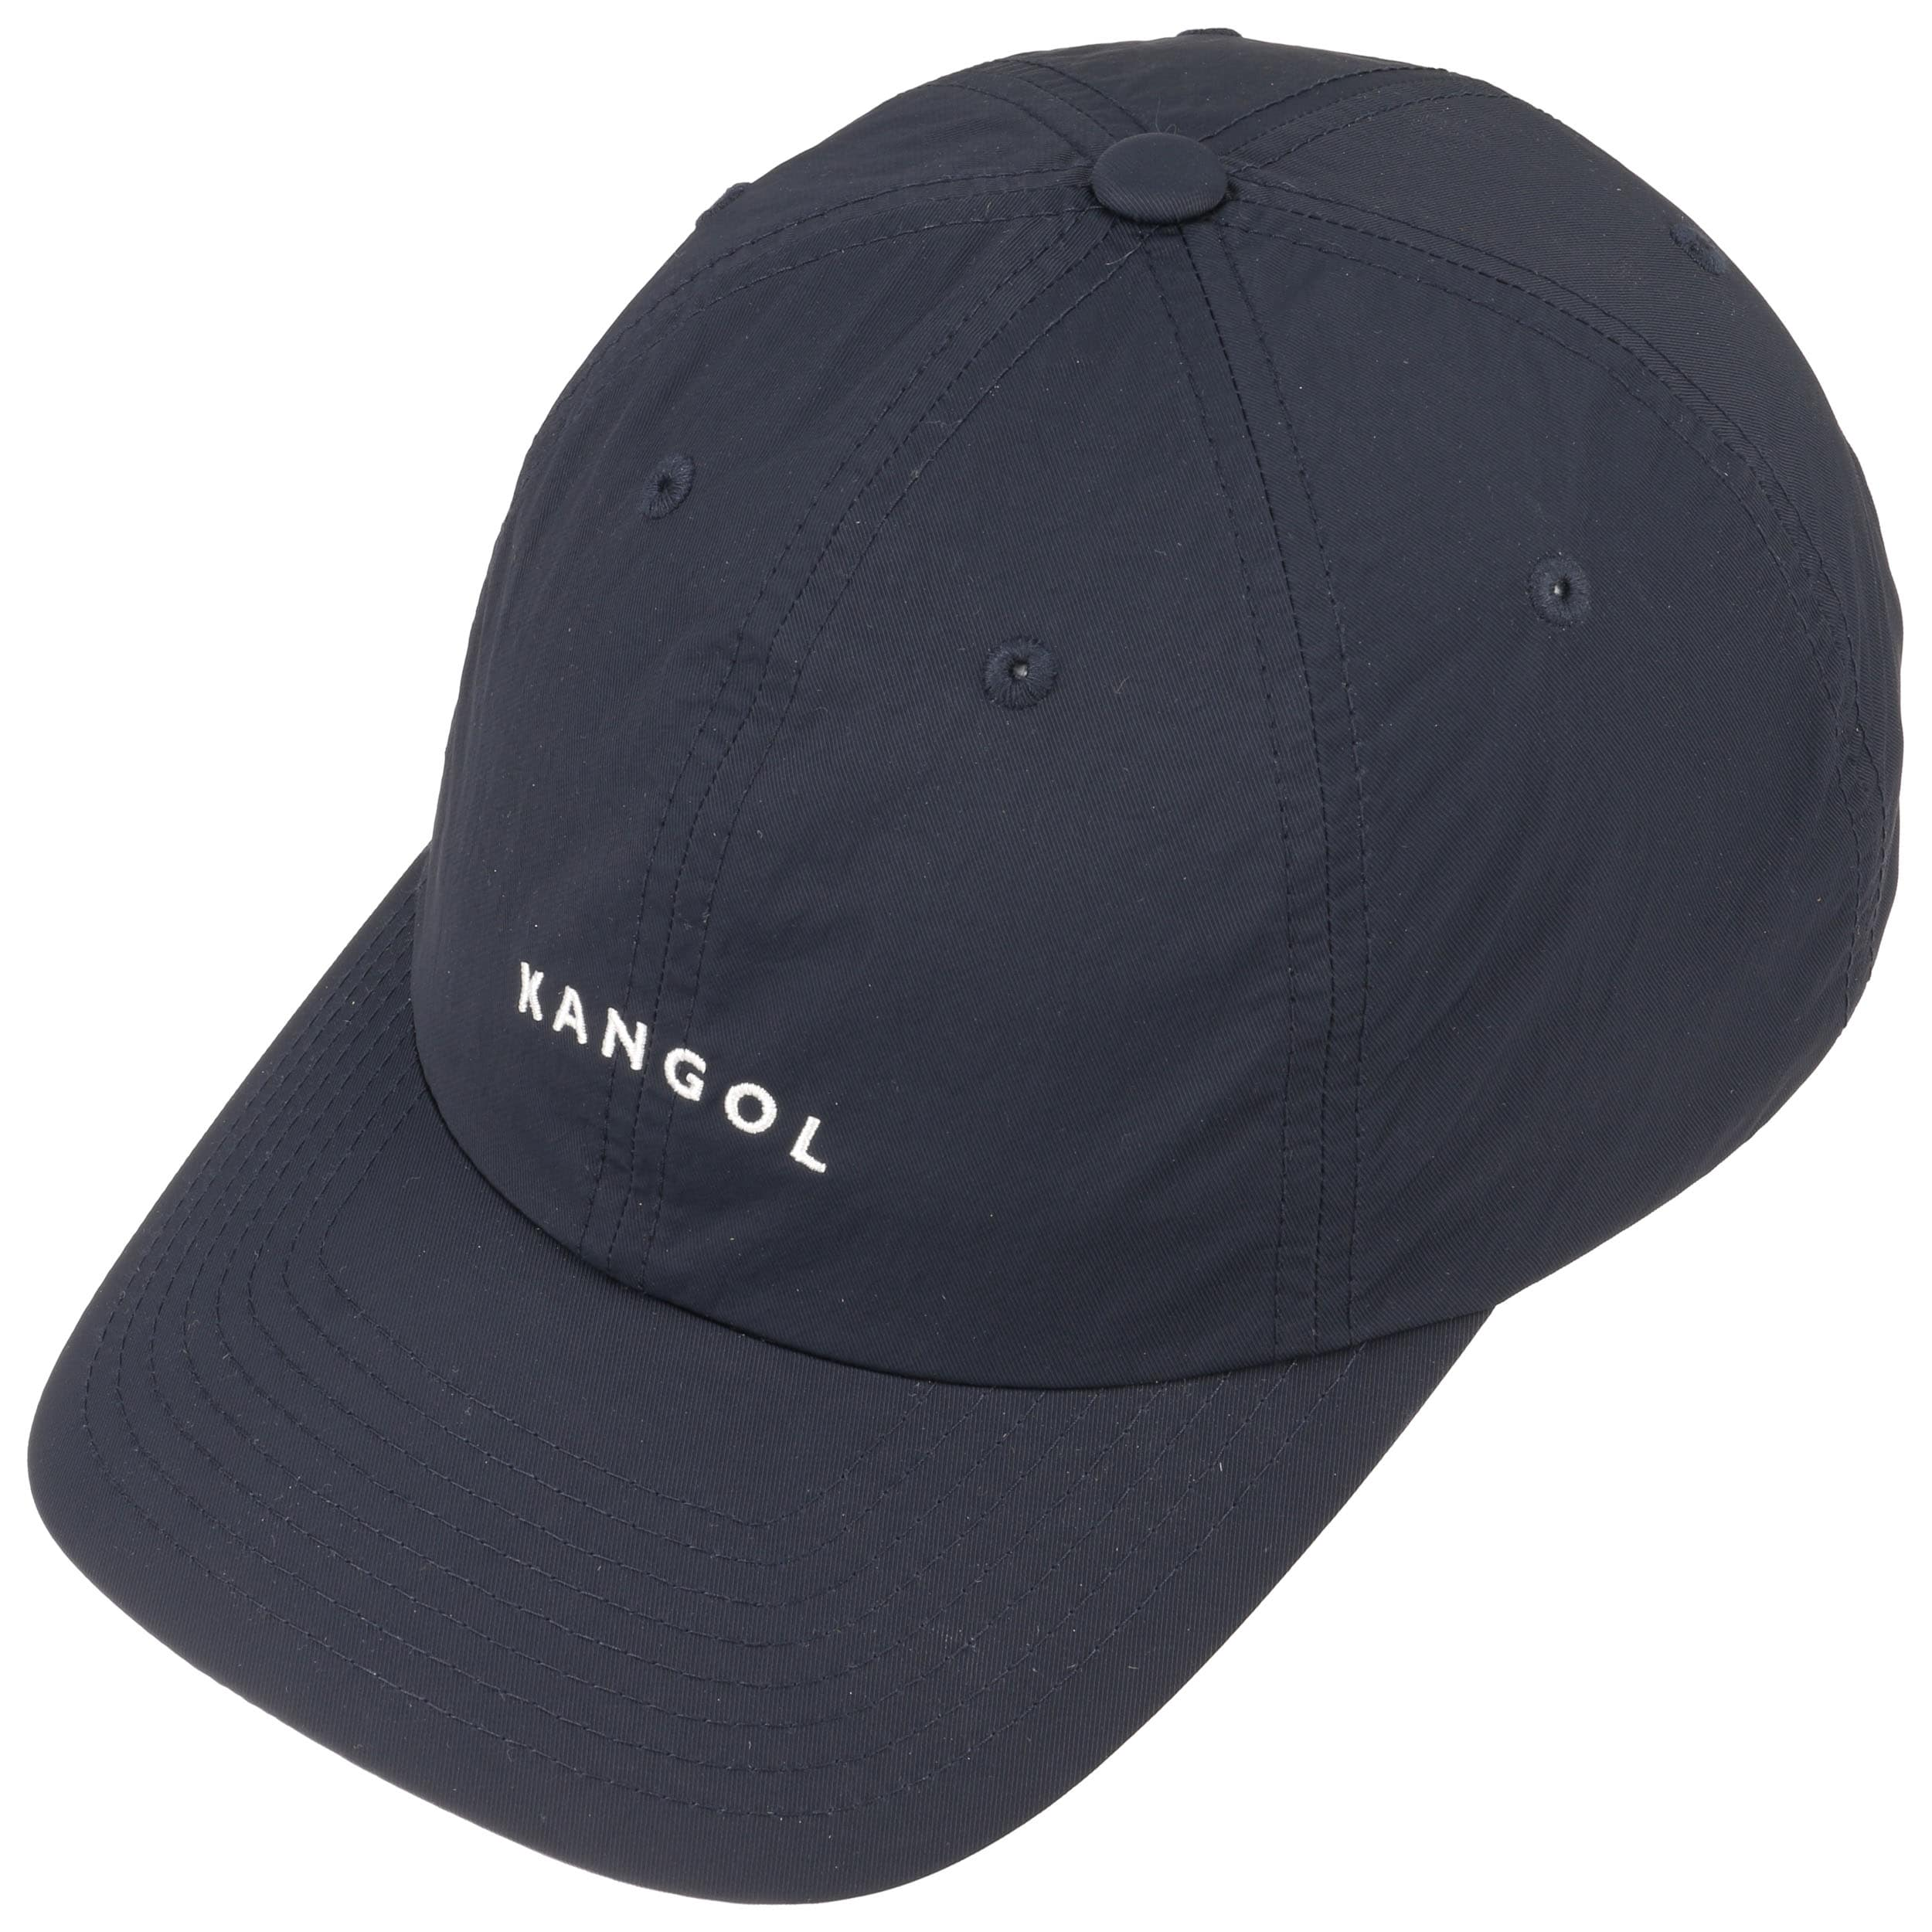 Kangol pour Homme Rétro Vintage Cut /& Sew Workwear Baseball Cap